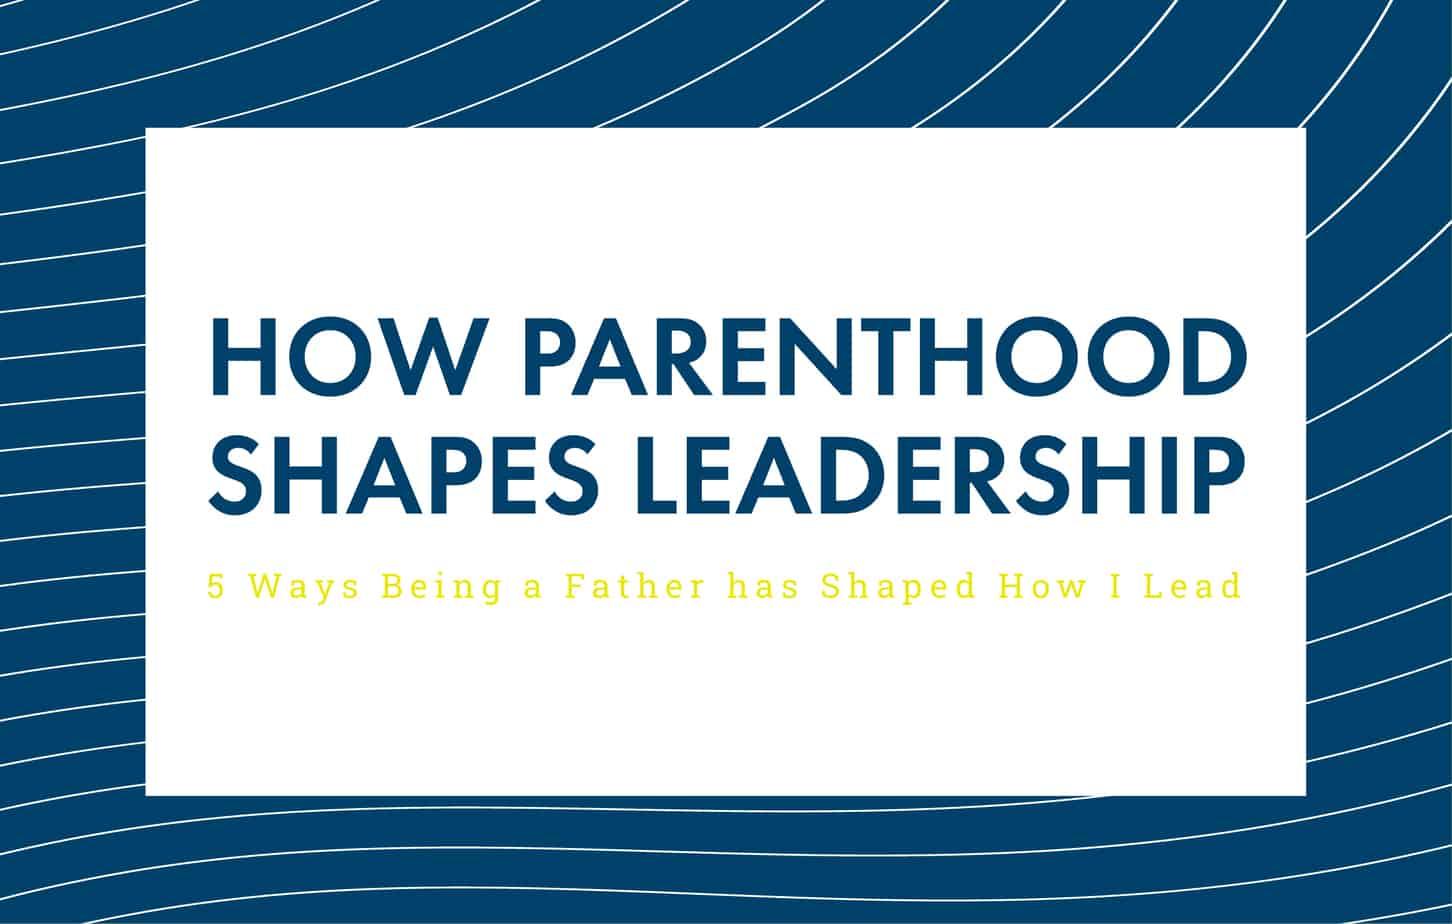 How Parenthood Shapes Leadership